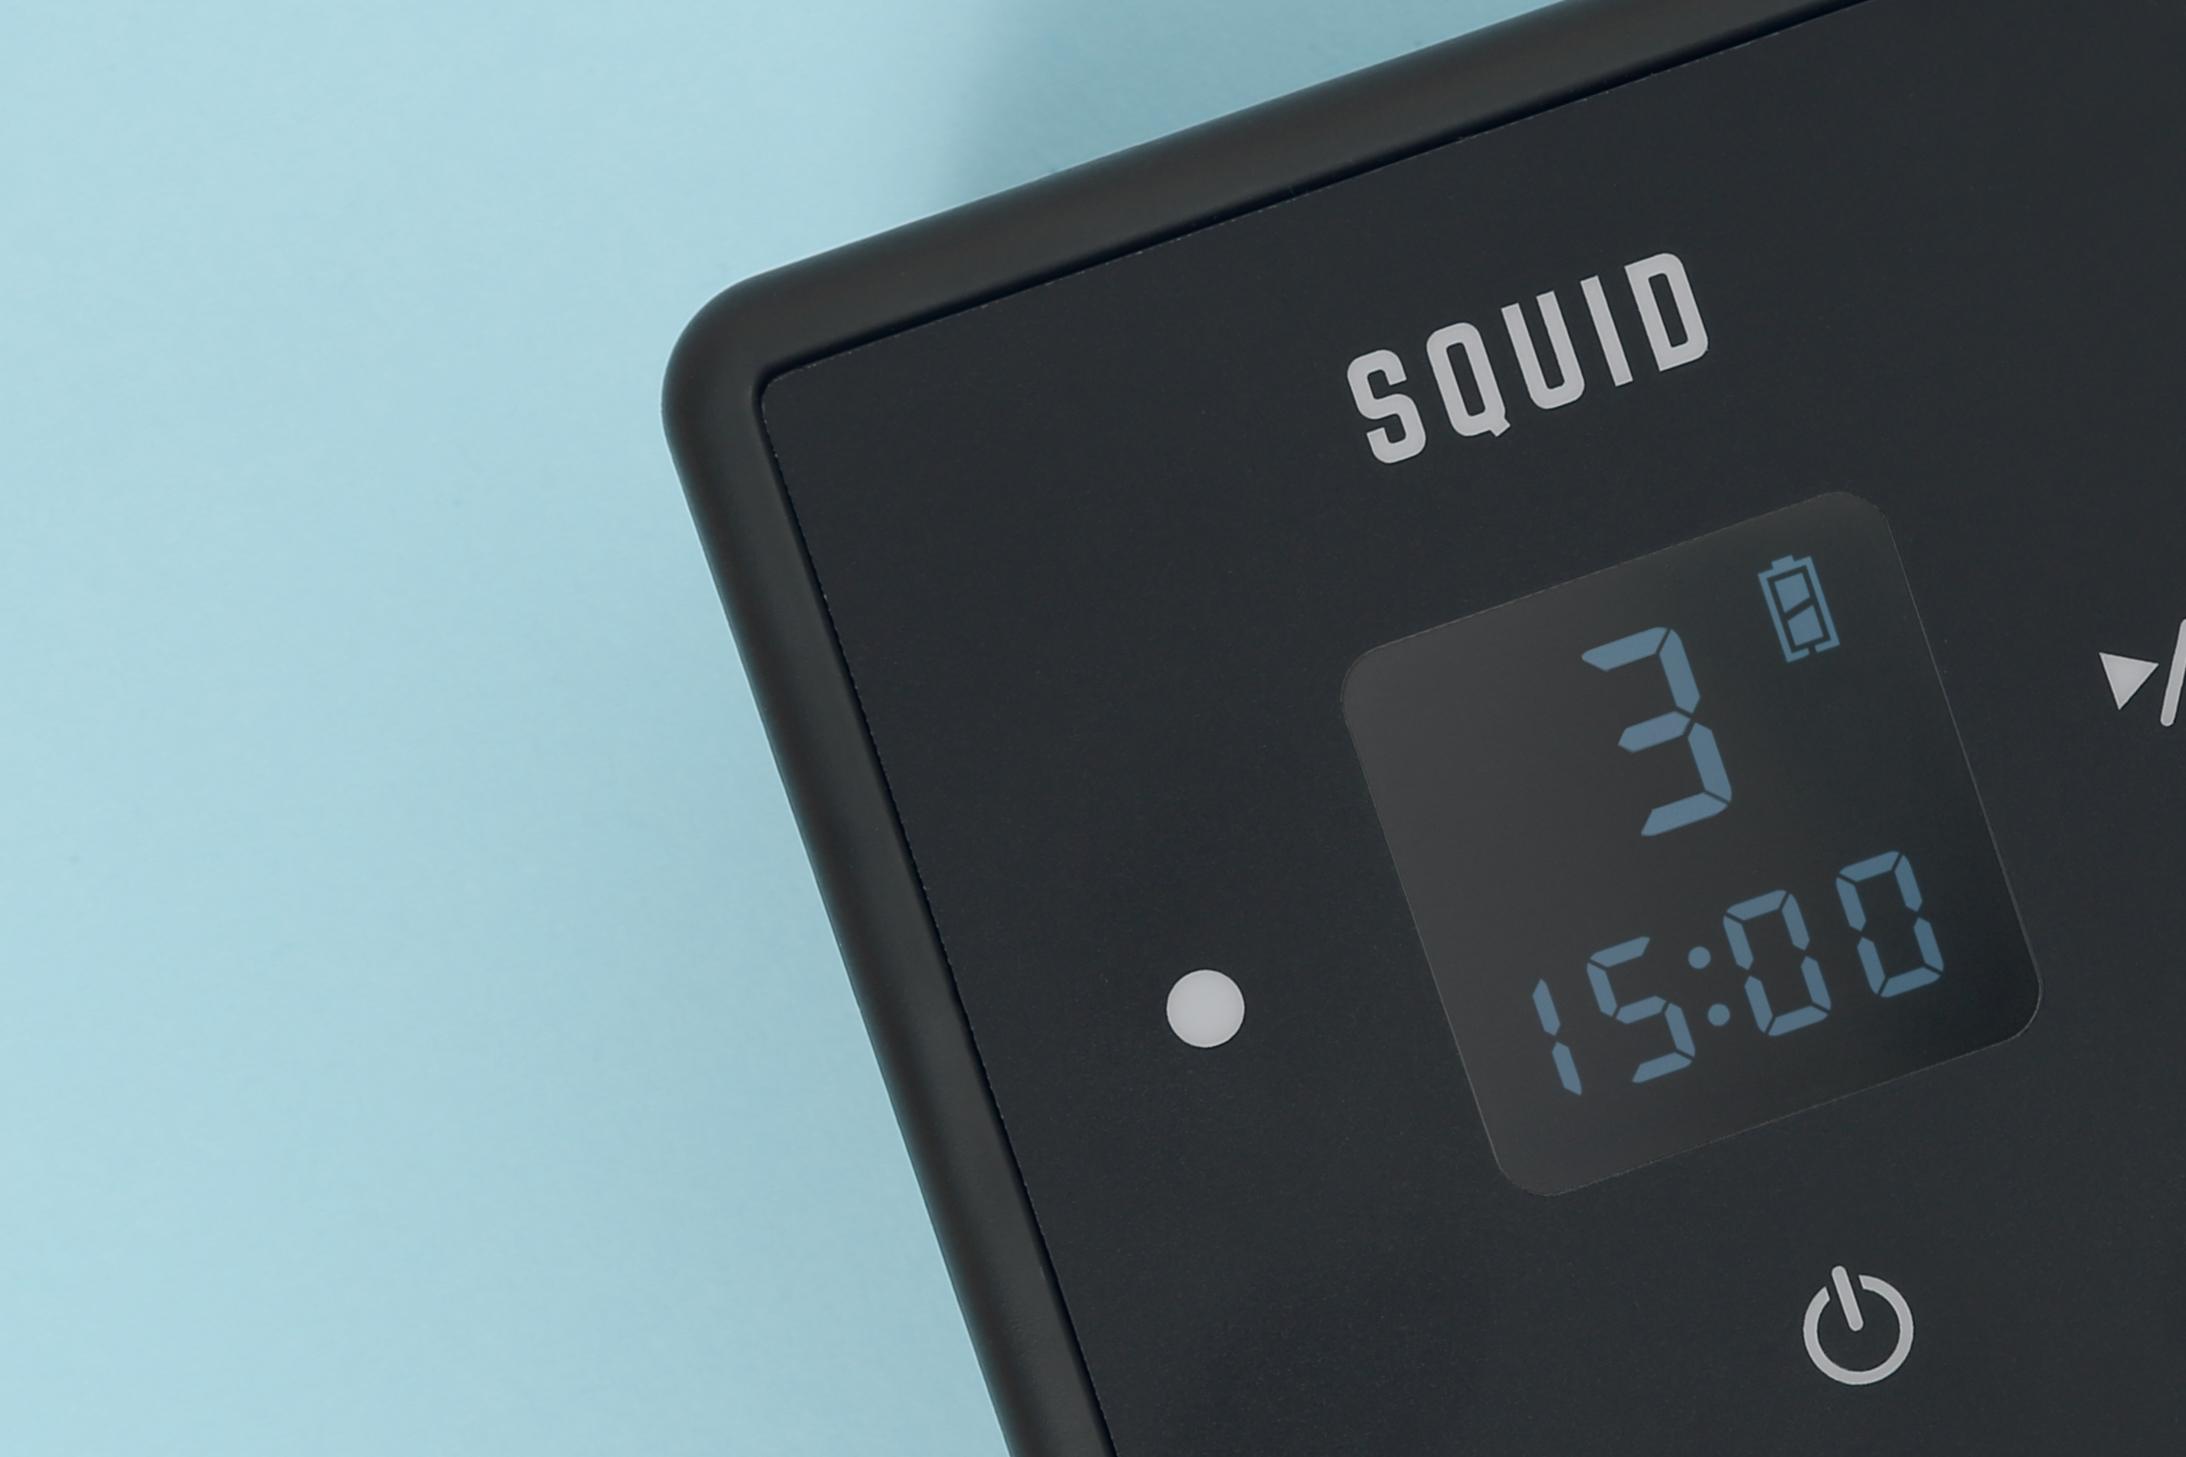 SquidGo_JCB_Pump -1.jpg